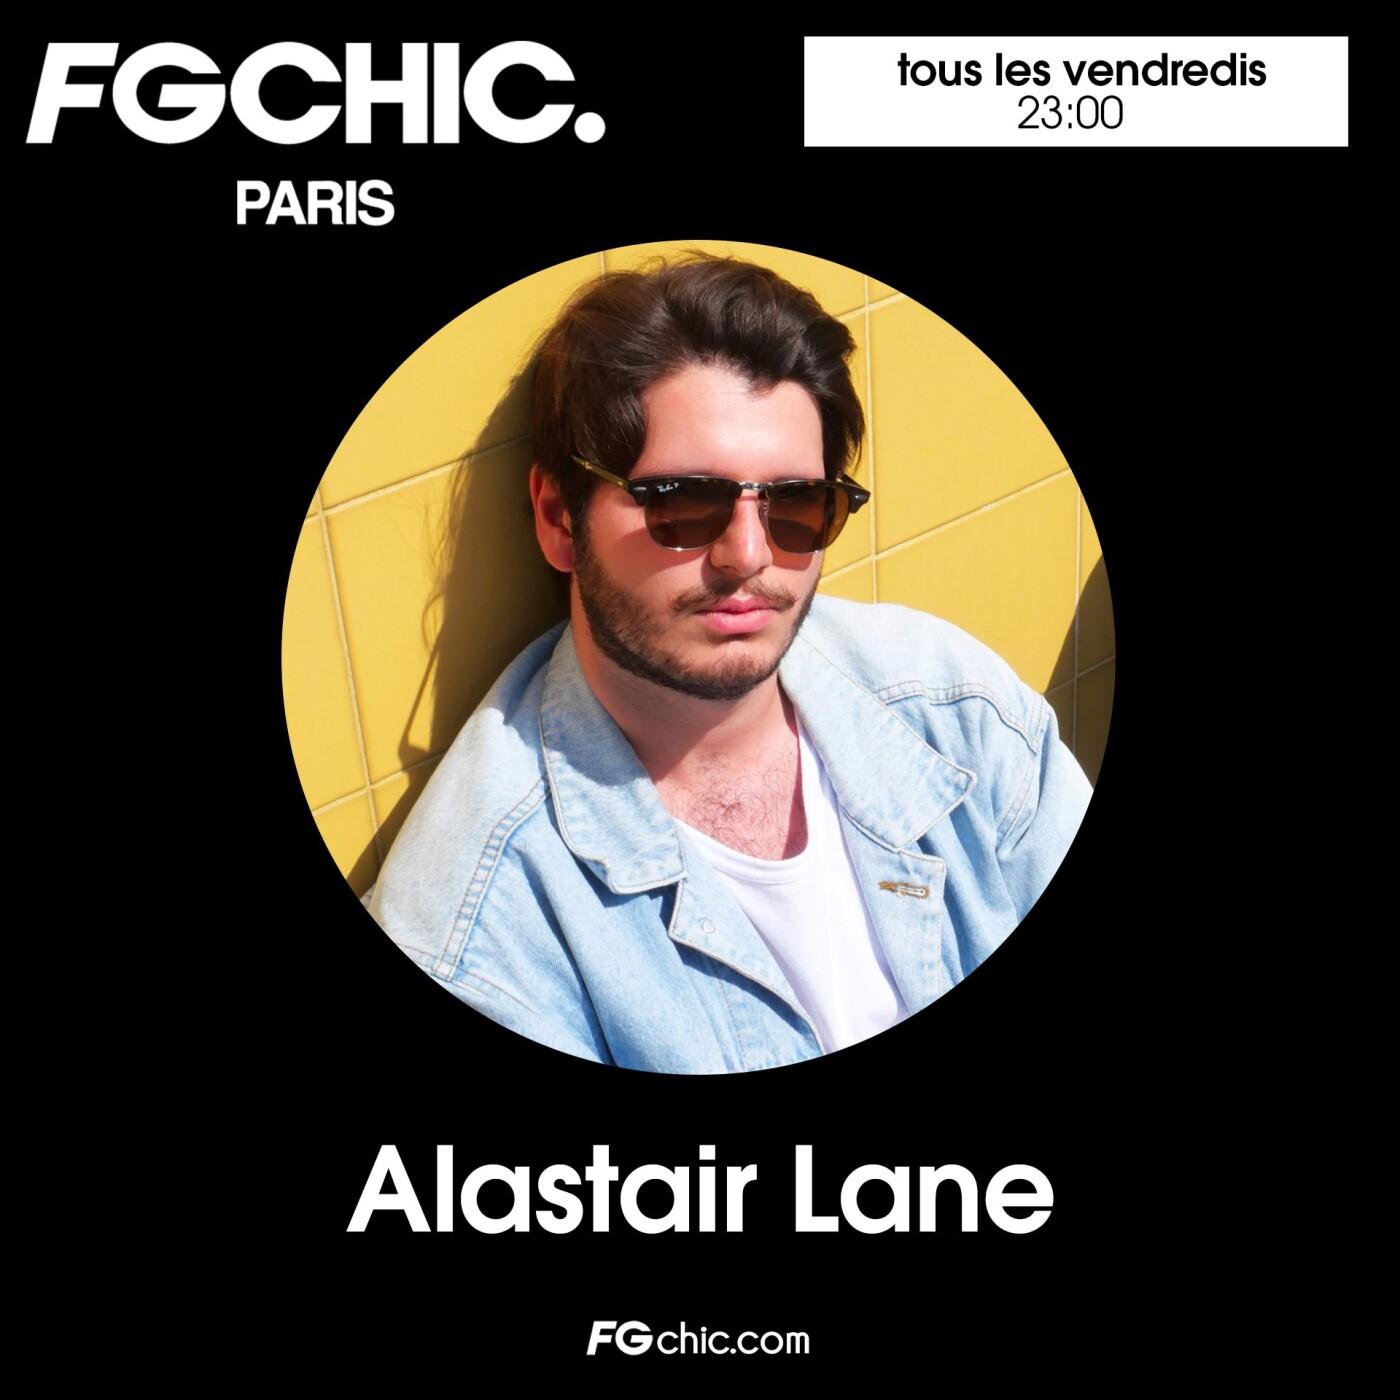 FG CHIC MIX BY ALASTRAIR LANE